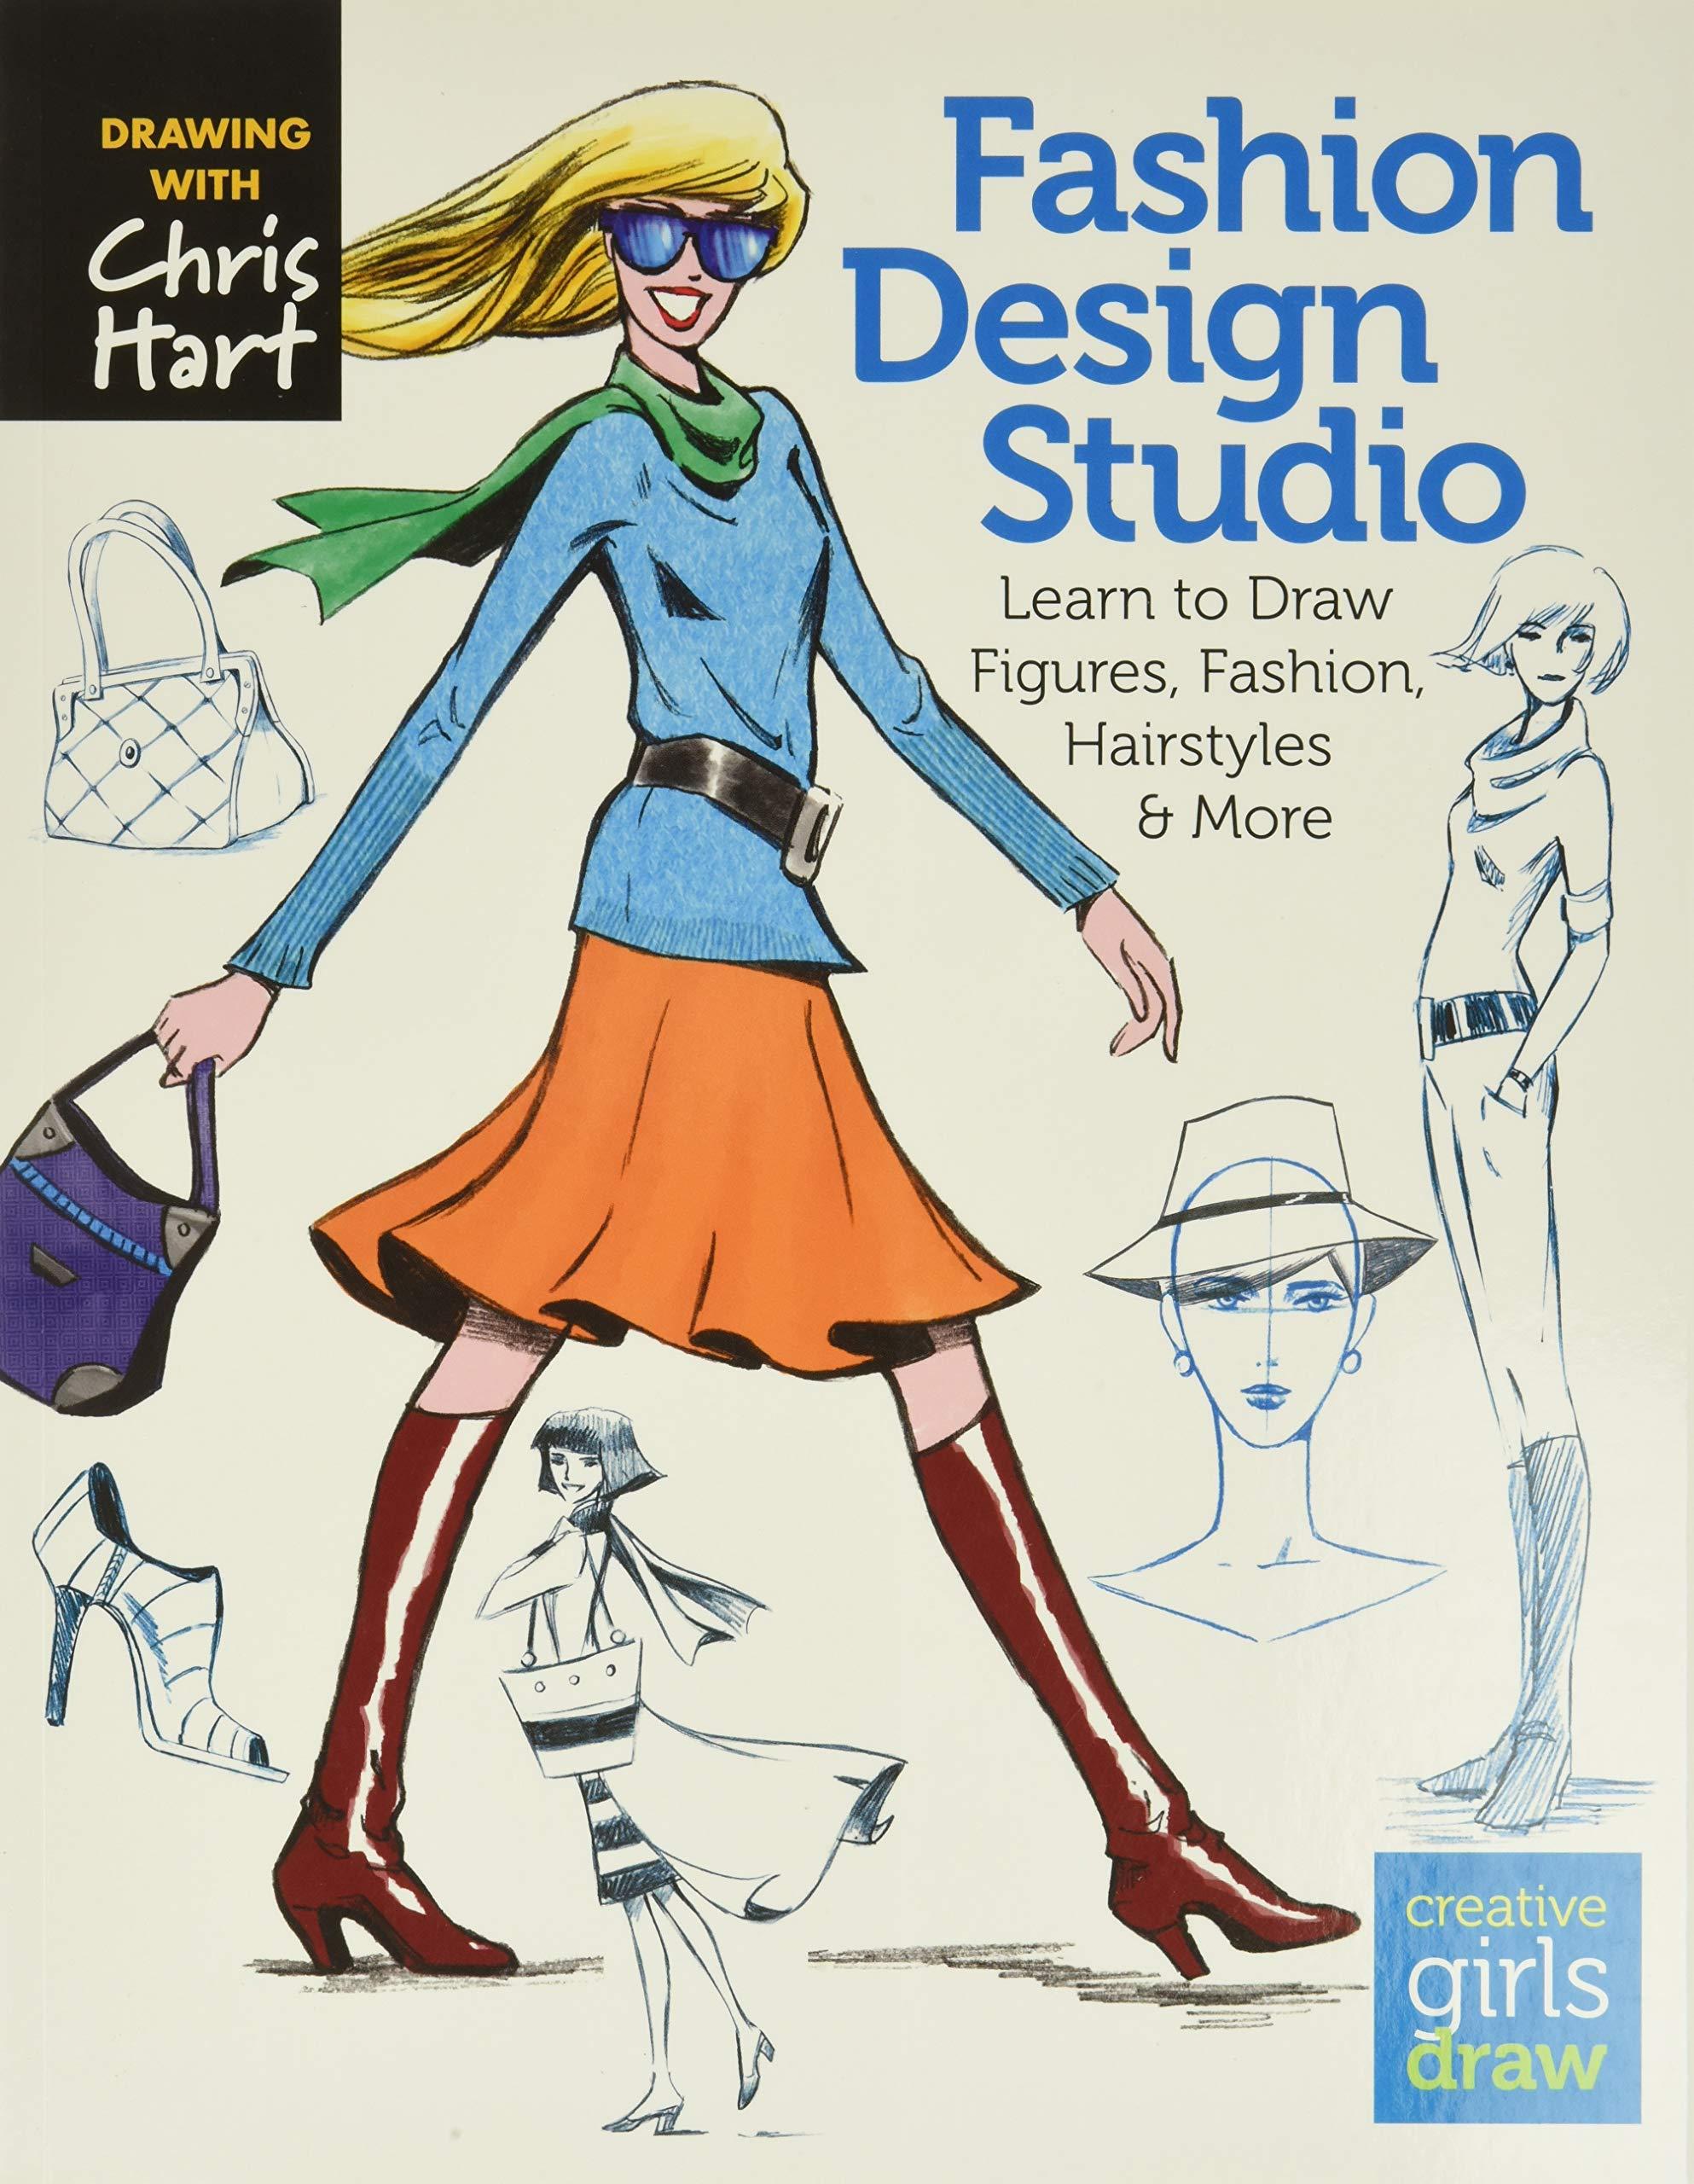 Fashion Design Studio Learn To Draw Figures Fashion Hairstyles More Creative Girls Draw Hart Christopher 9781936096626 Amazon Com Books